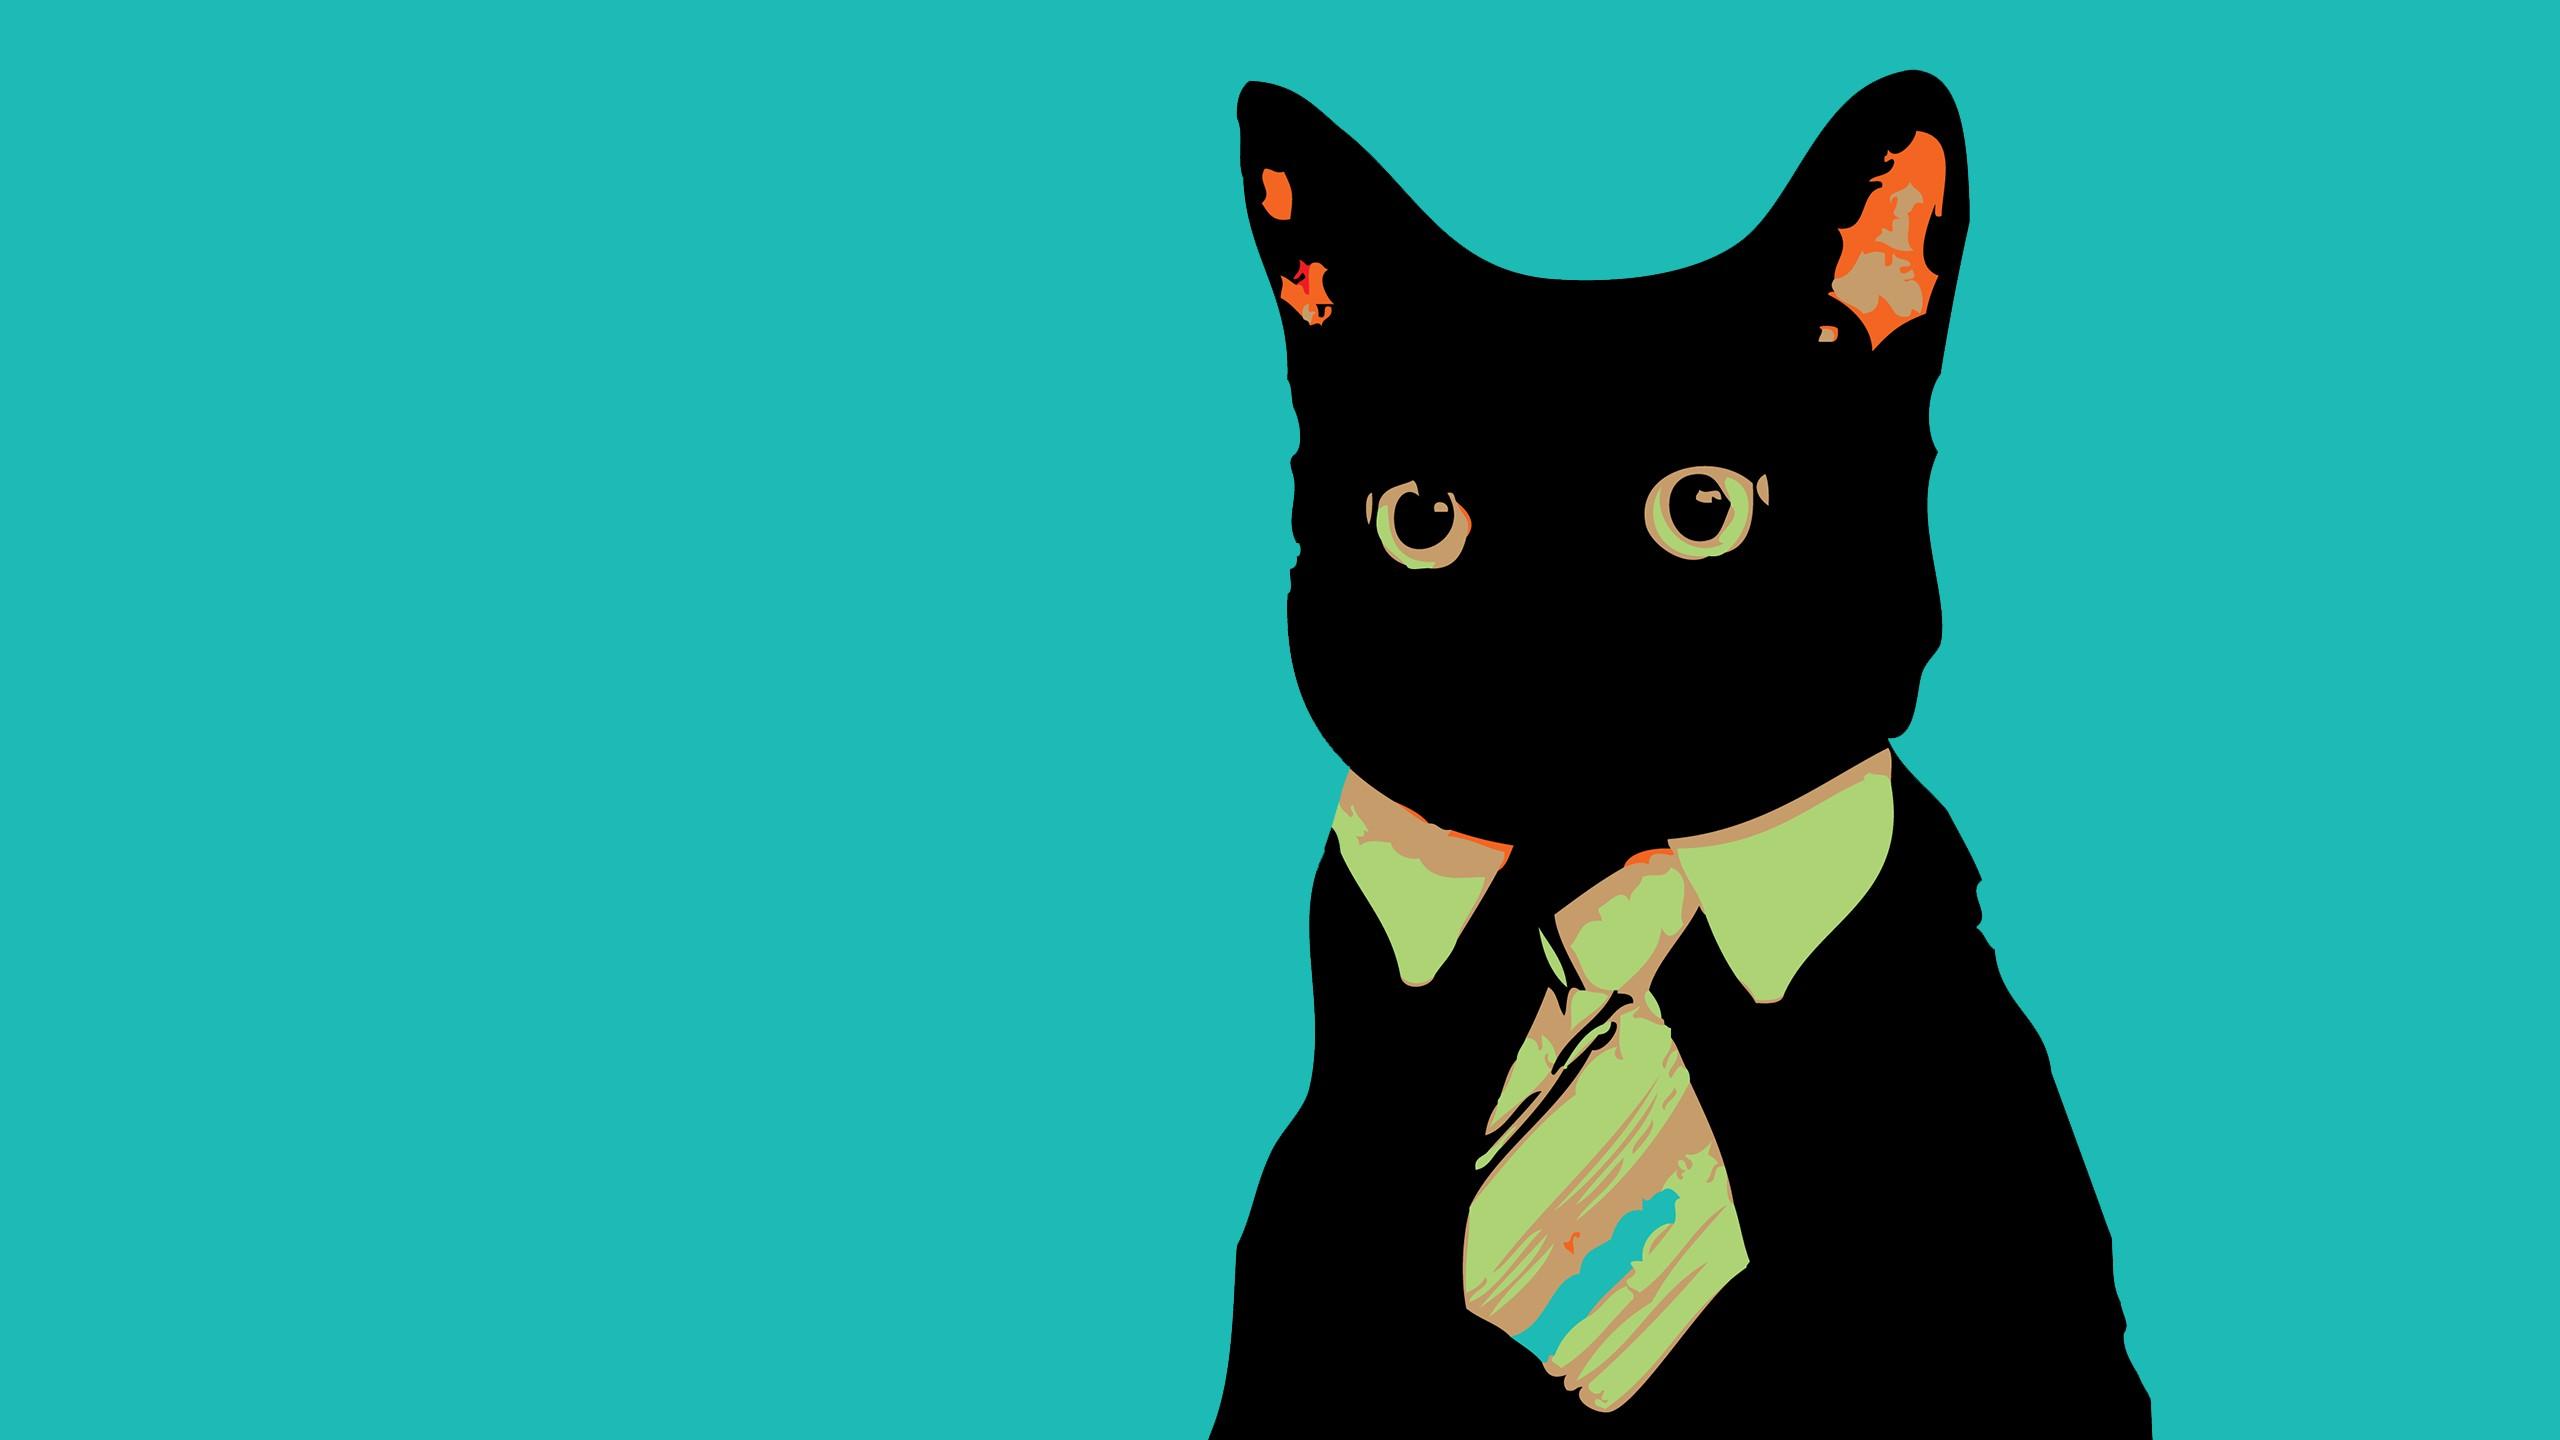 Cats animals vector tie meme business business cat ...